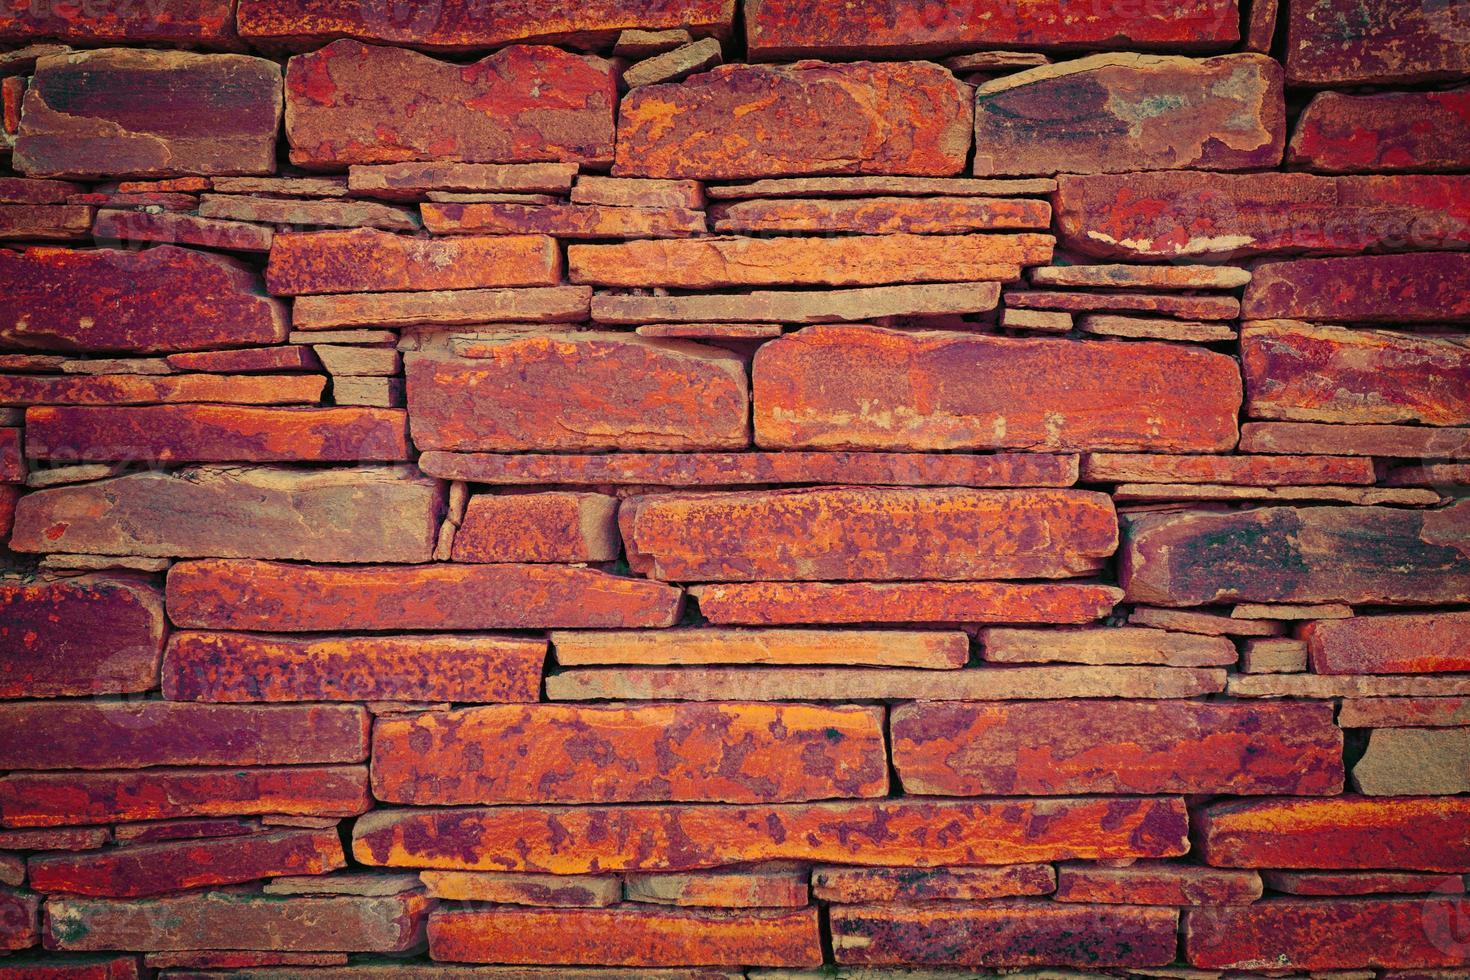 grunge vintage muur van stenen tegels foto